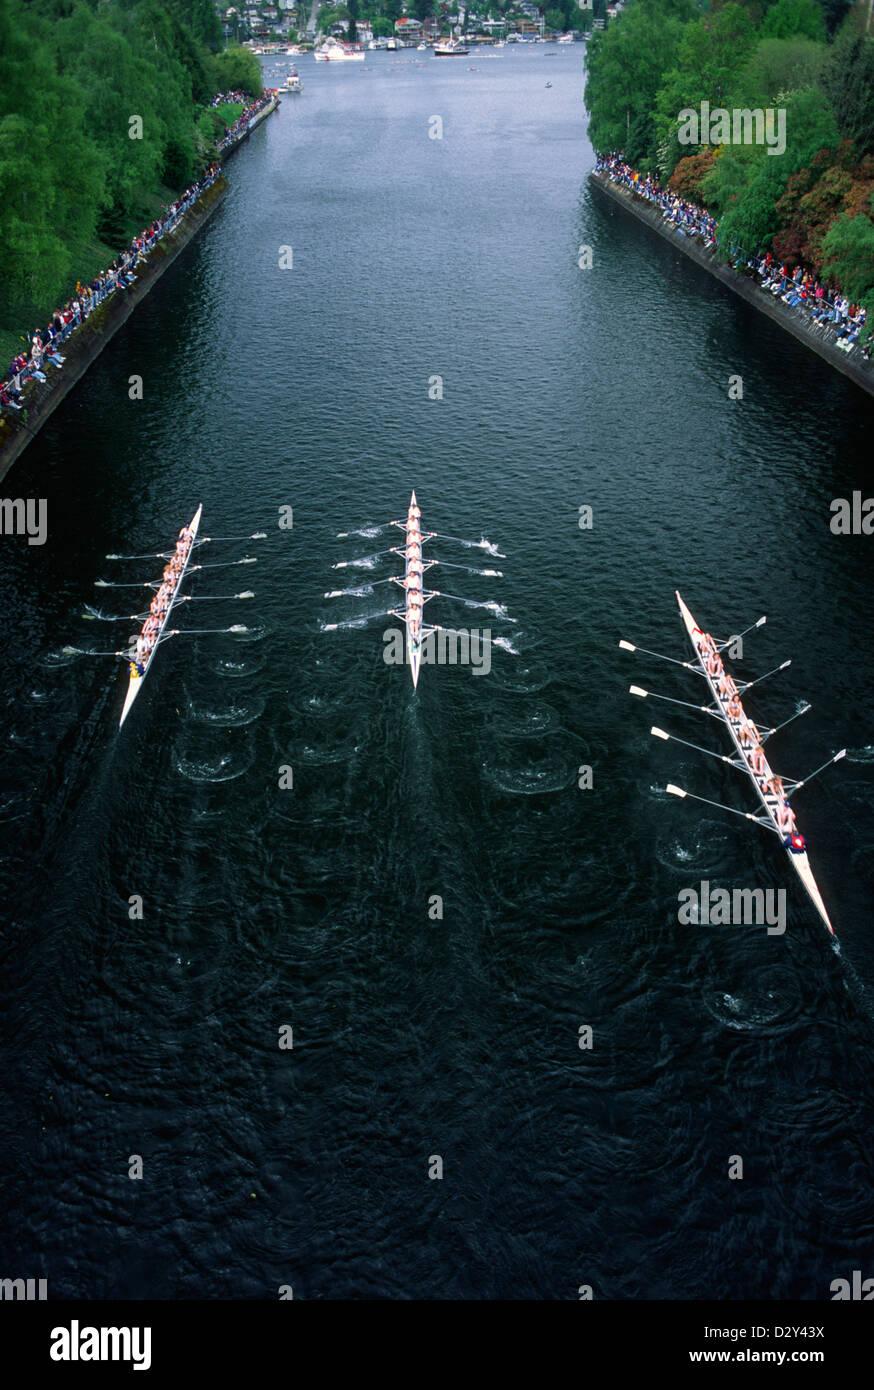 Crew Race, Seattle - Stock Image